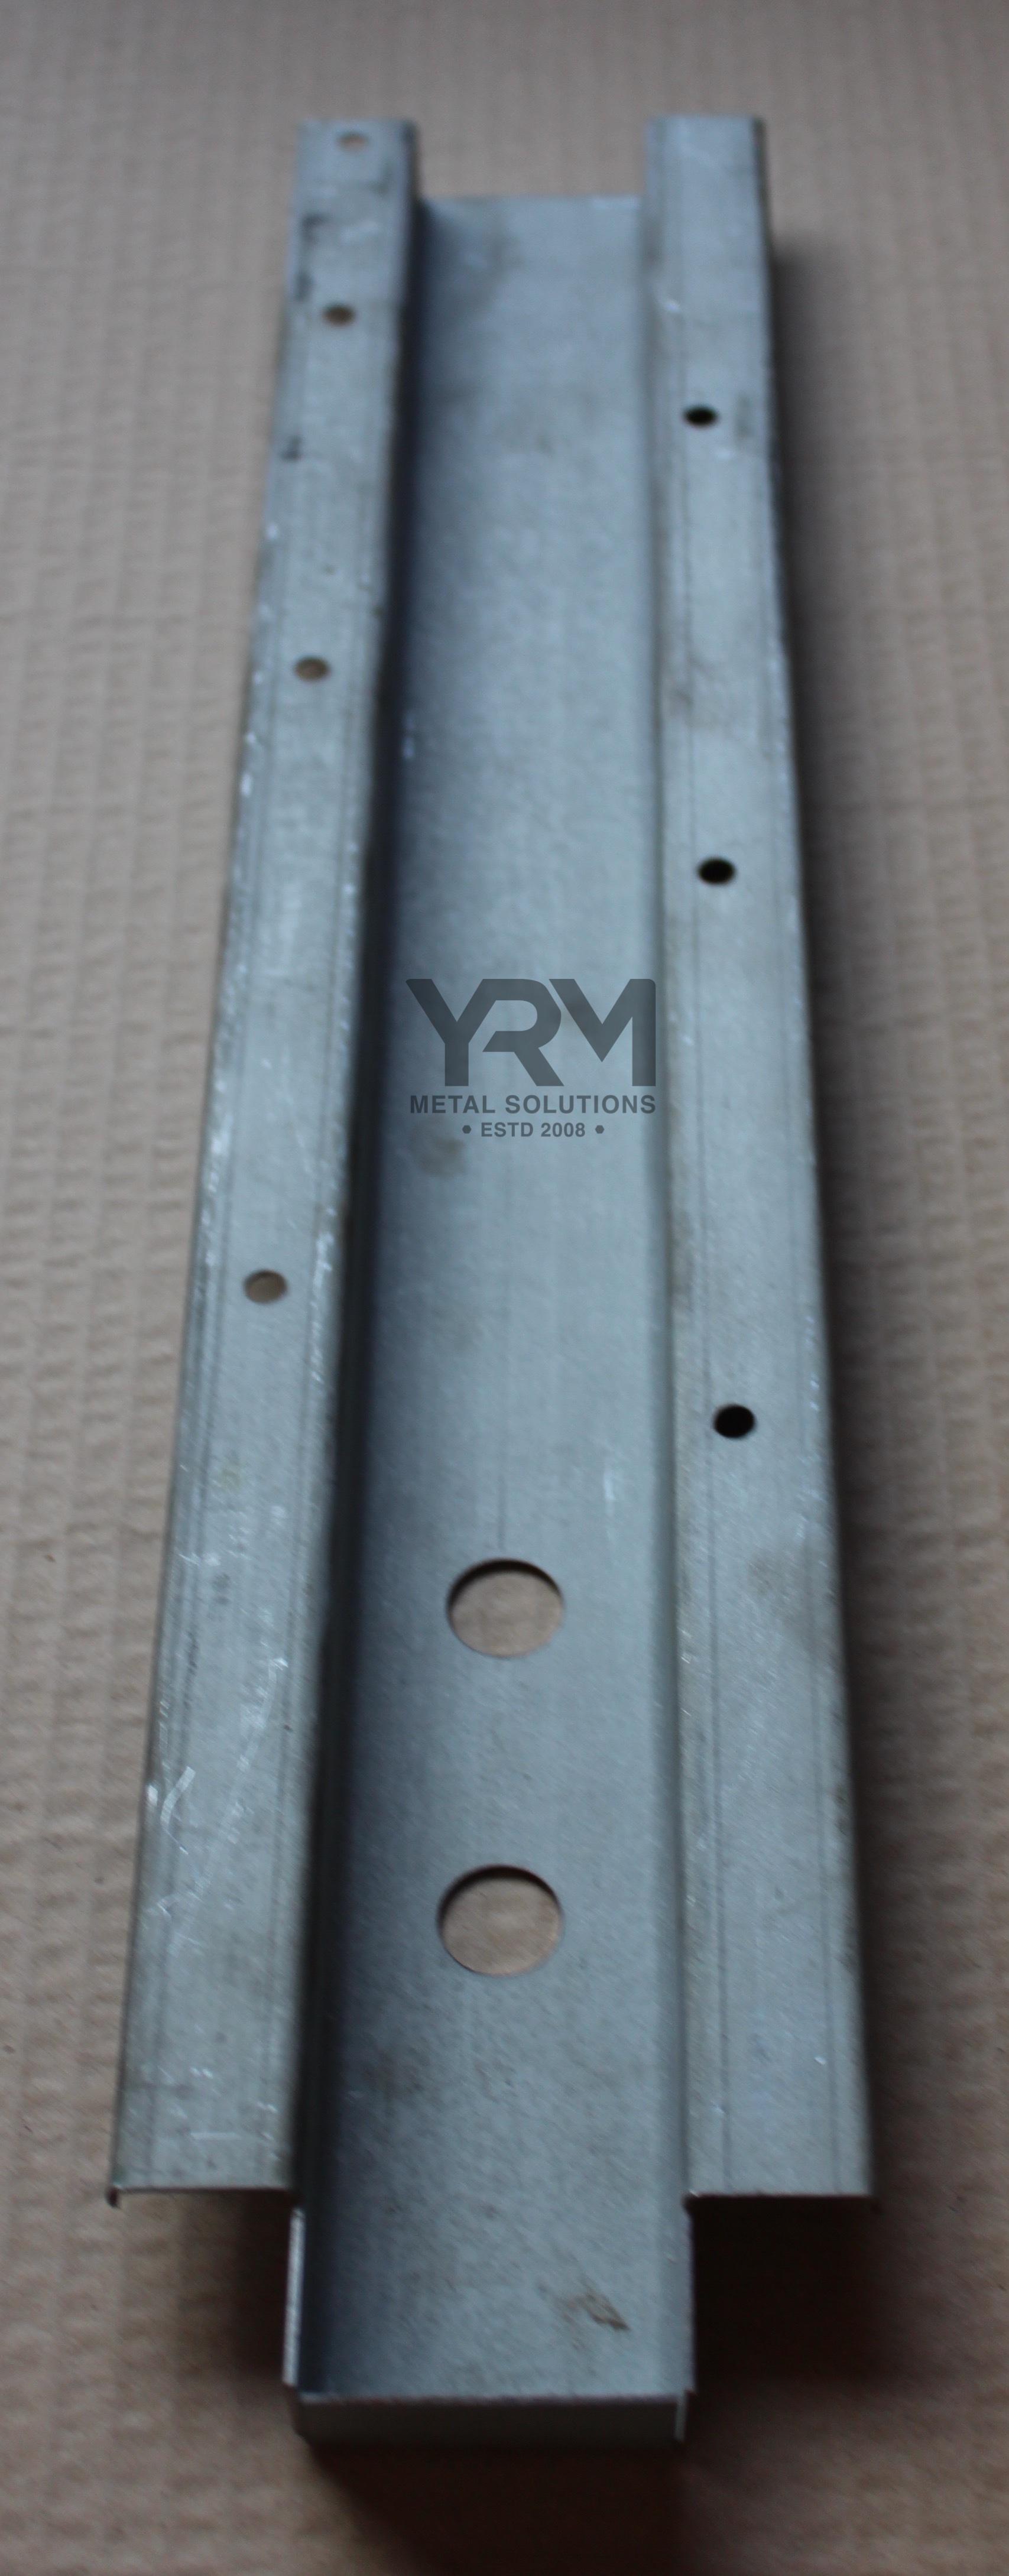 Rhs B Post Repair Section Yrm Metal Solutions